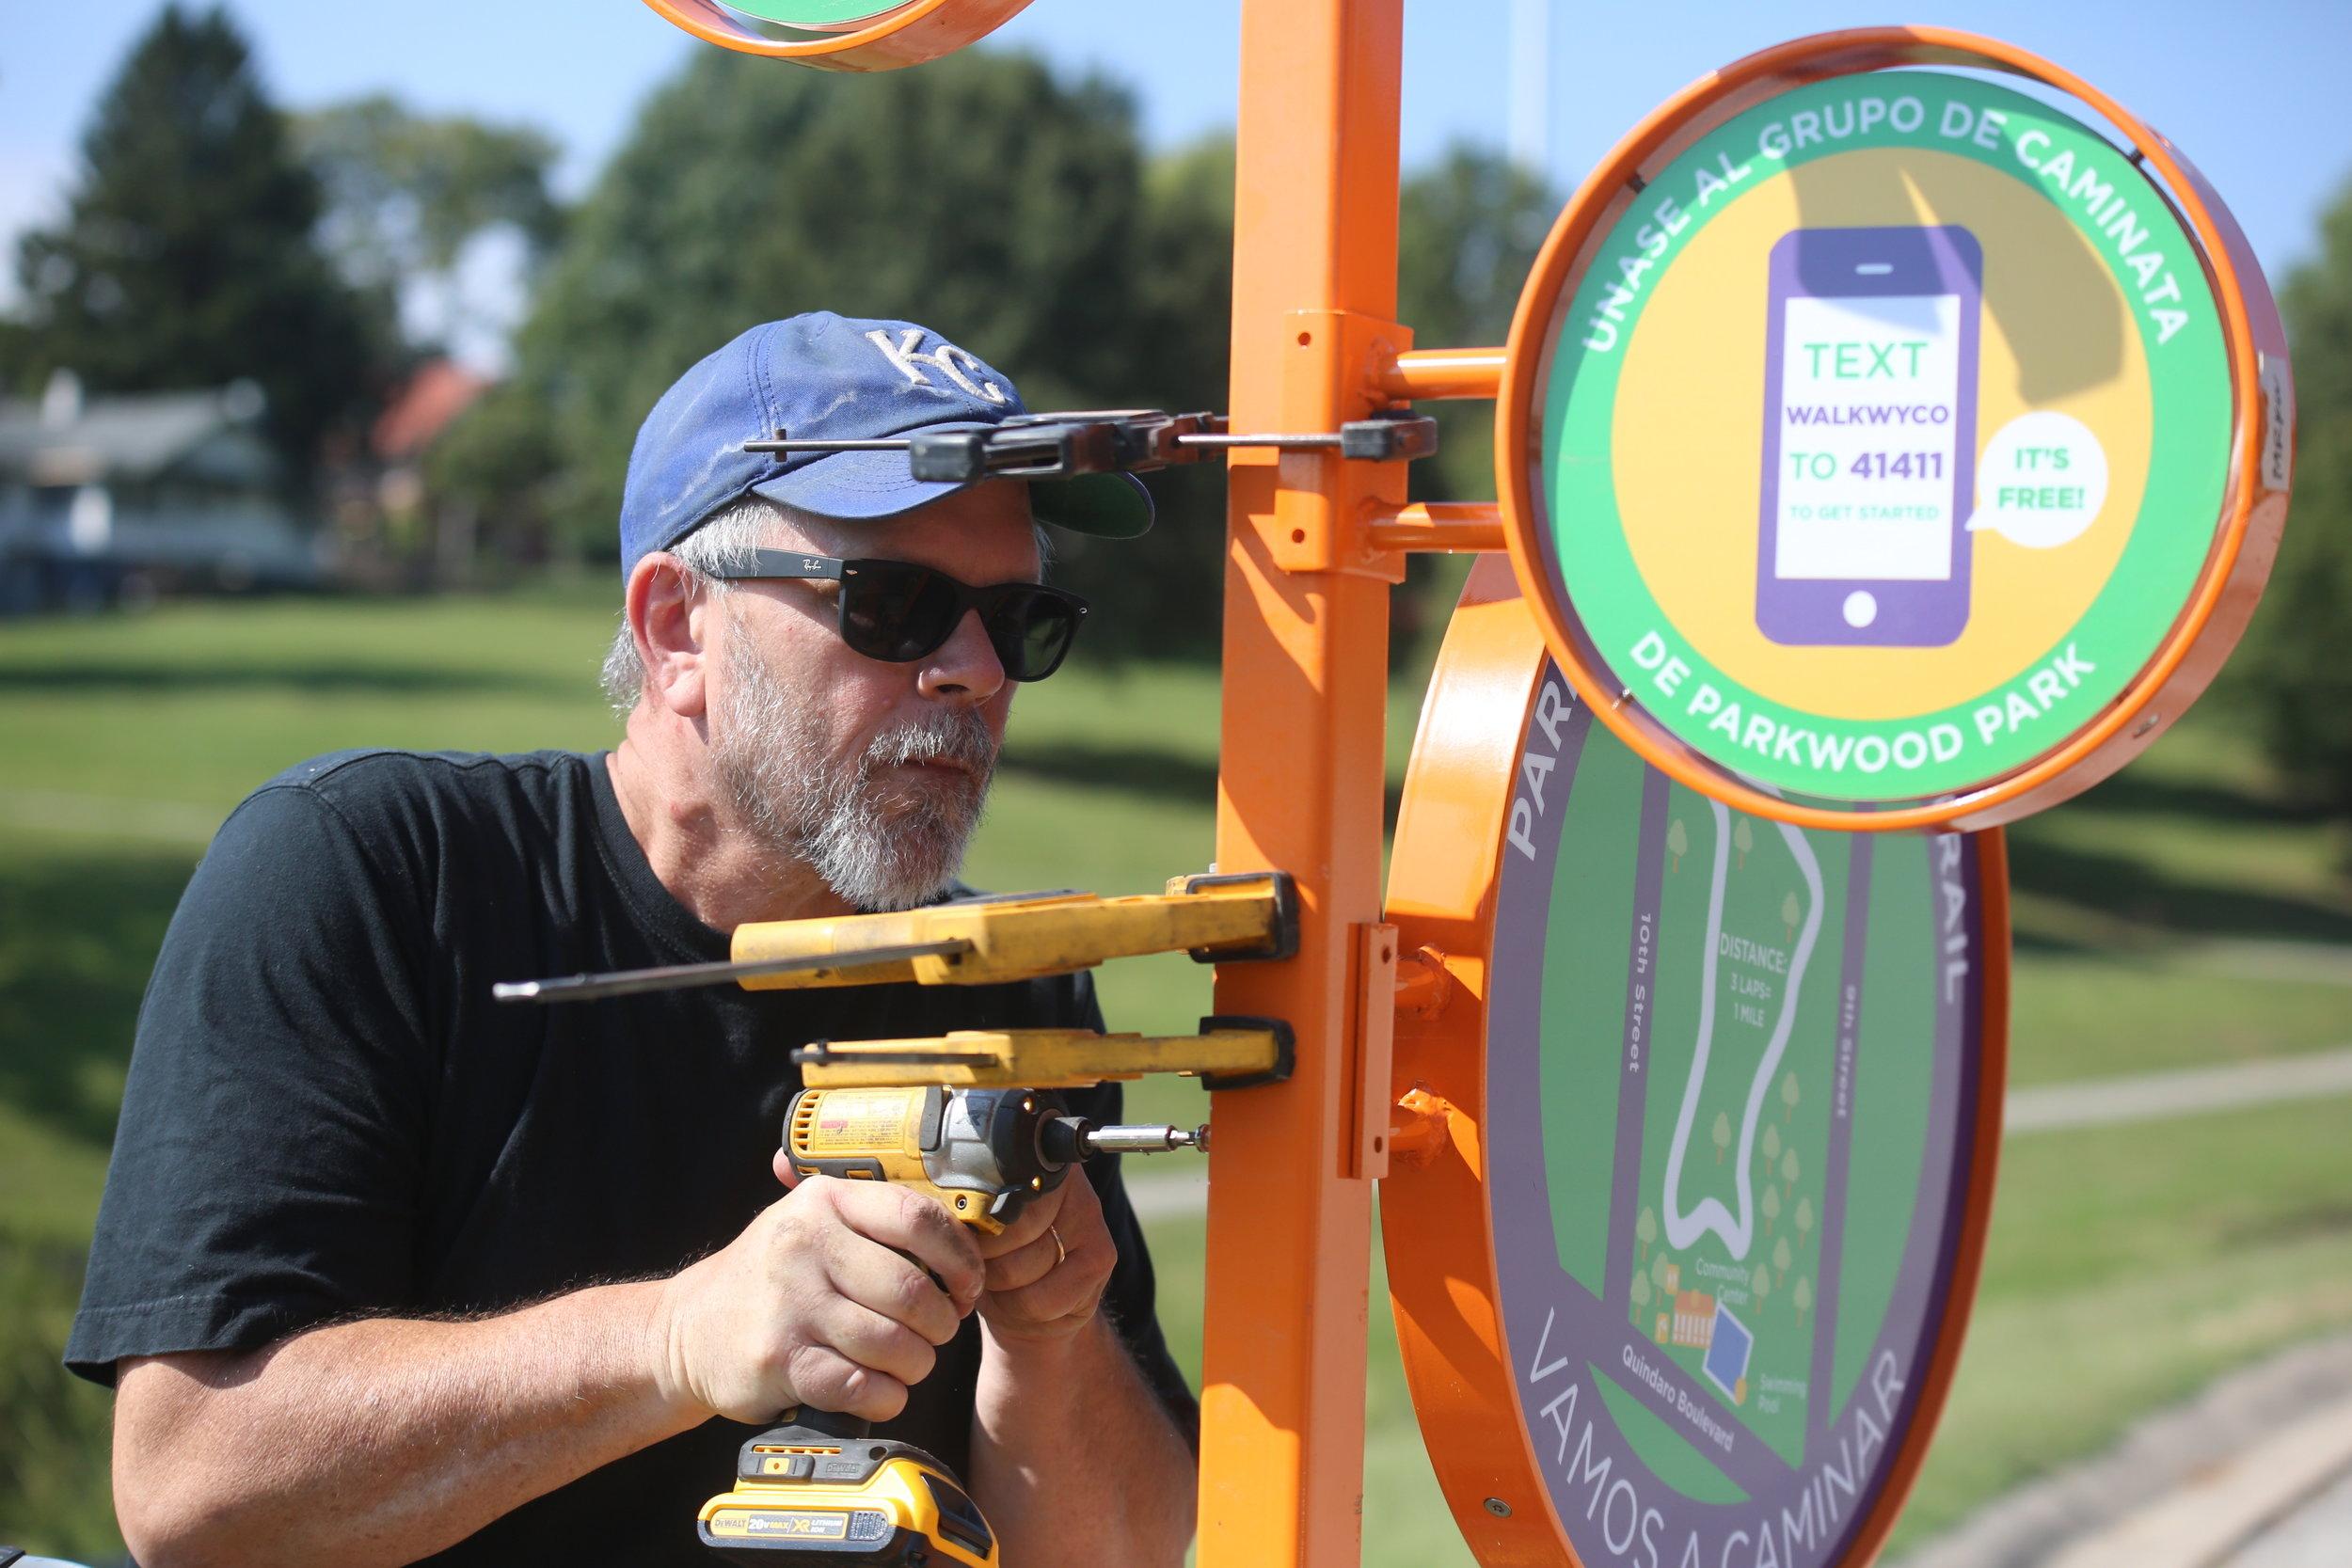 Professor Nils Gore installs the Parkwood Park Totem.